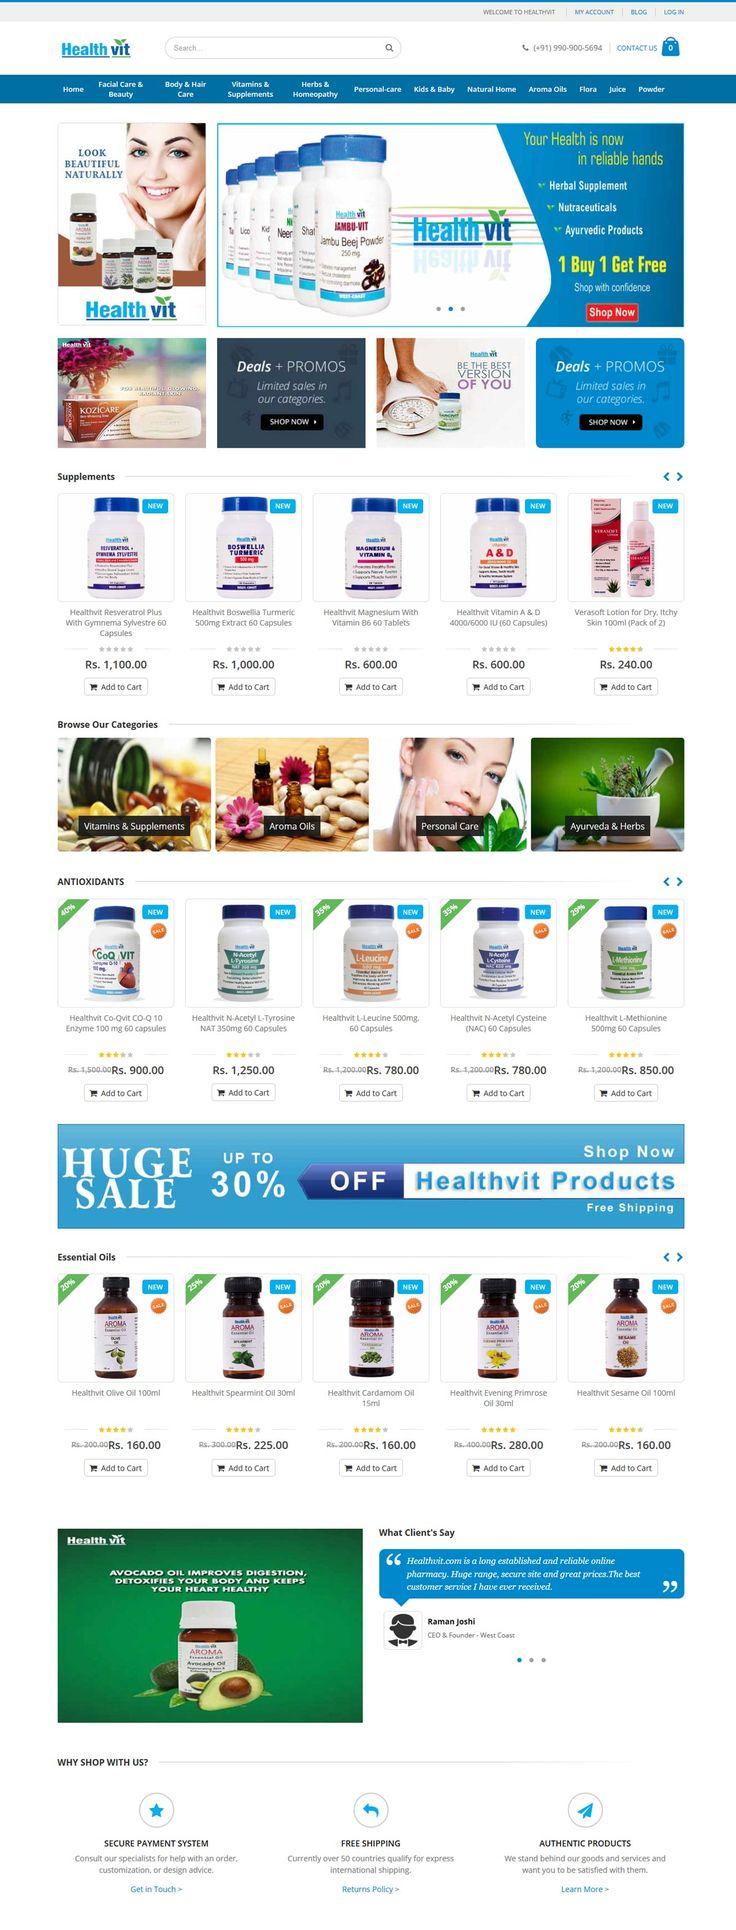 Healthvit.com - XMX Solutions